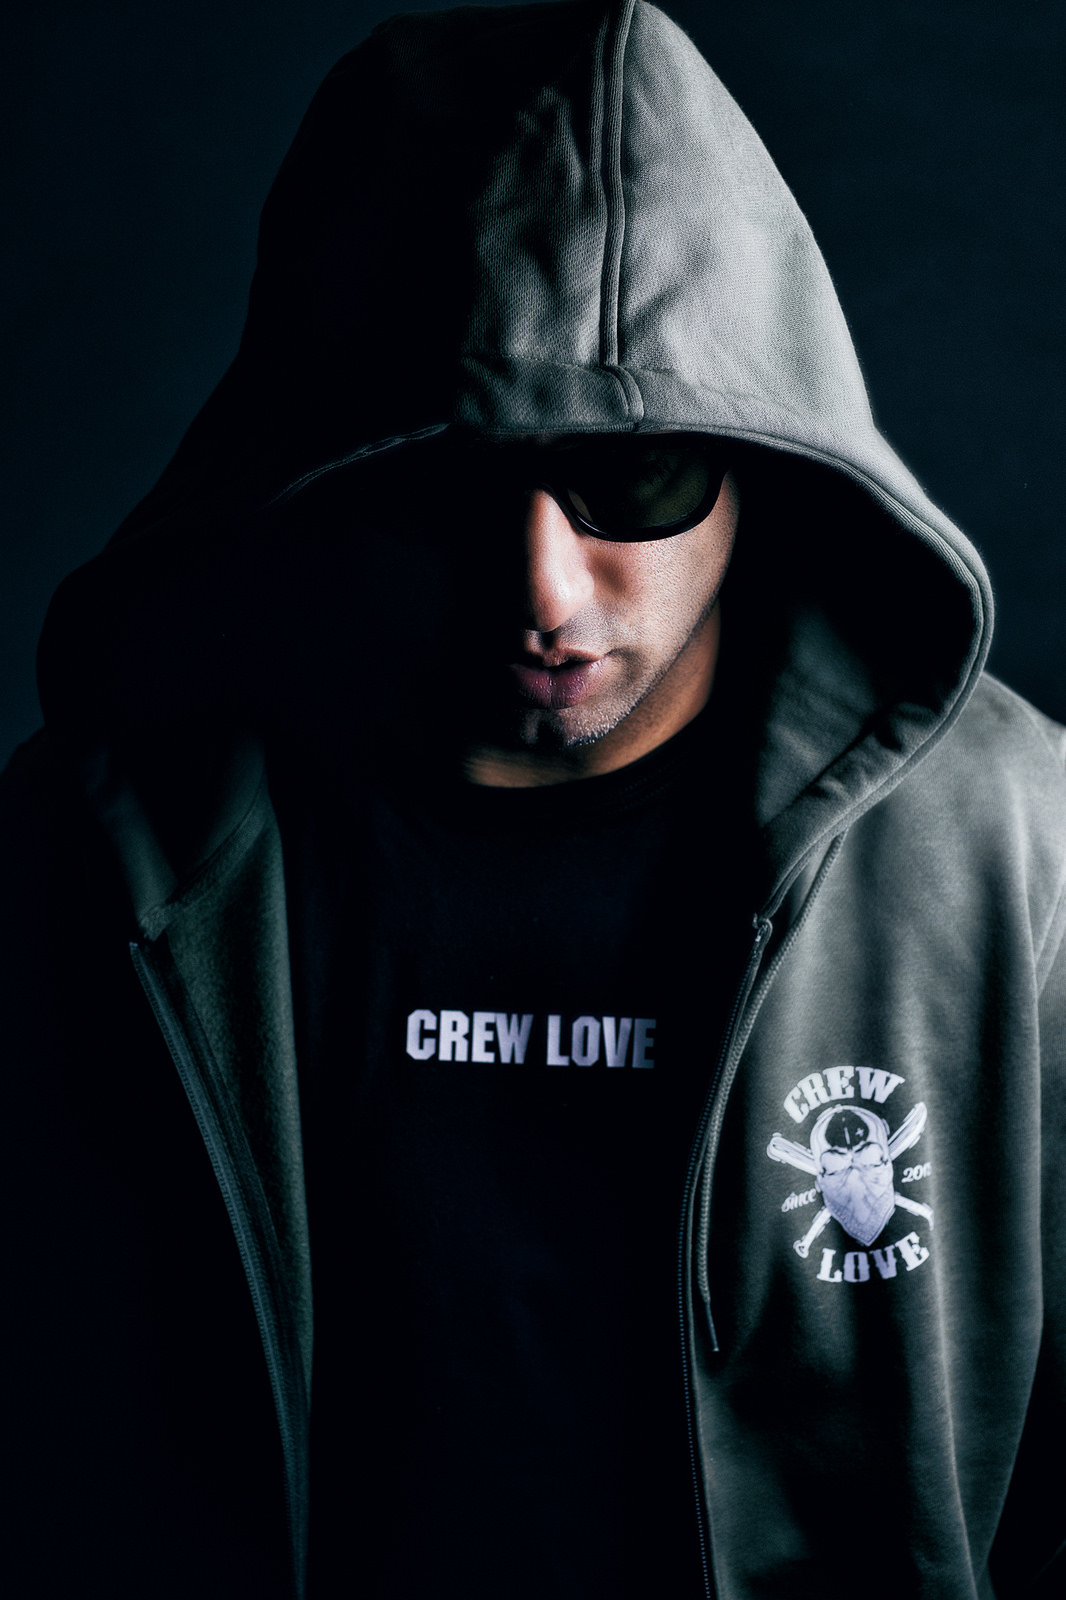 deejay 5